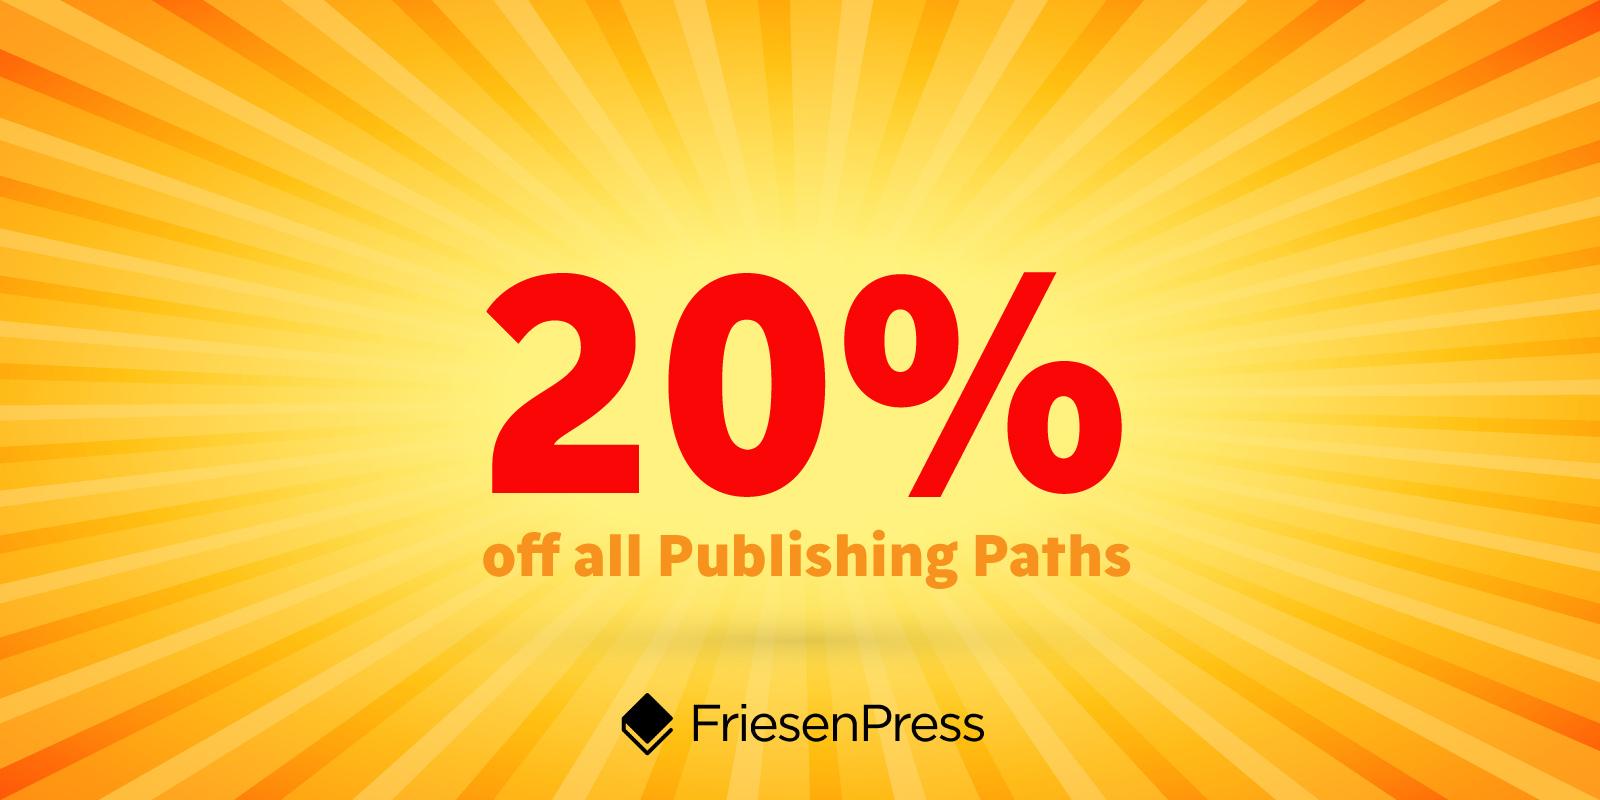 FriesenPress June 2017 Promotional Offer